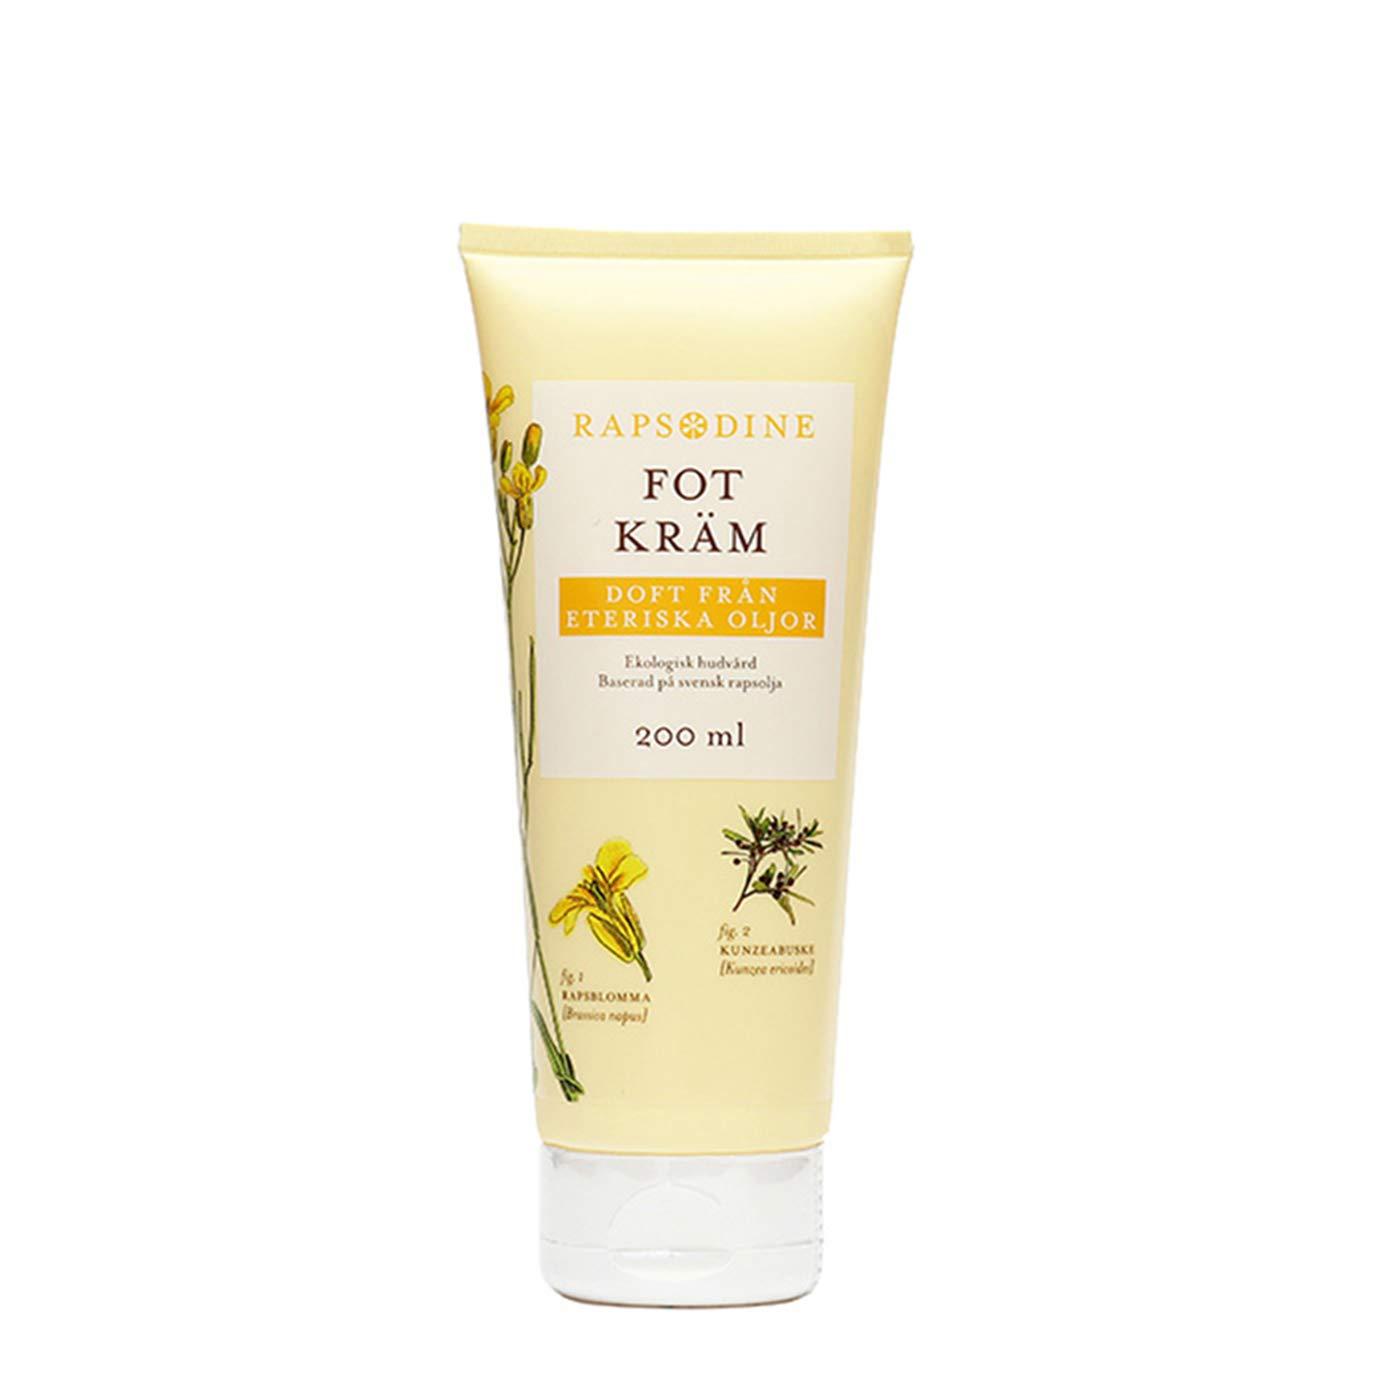 Rapsodine Moisturizing Foot Cream with Kunzea and organic Swedish Canola oil, 200 ML / 6.76 oz